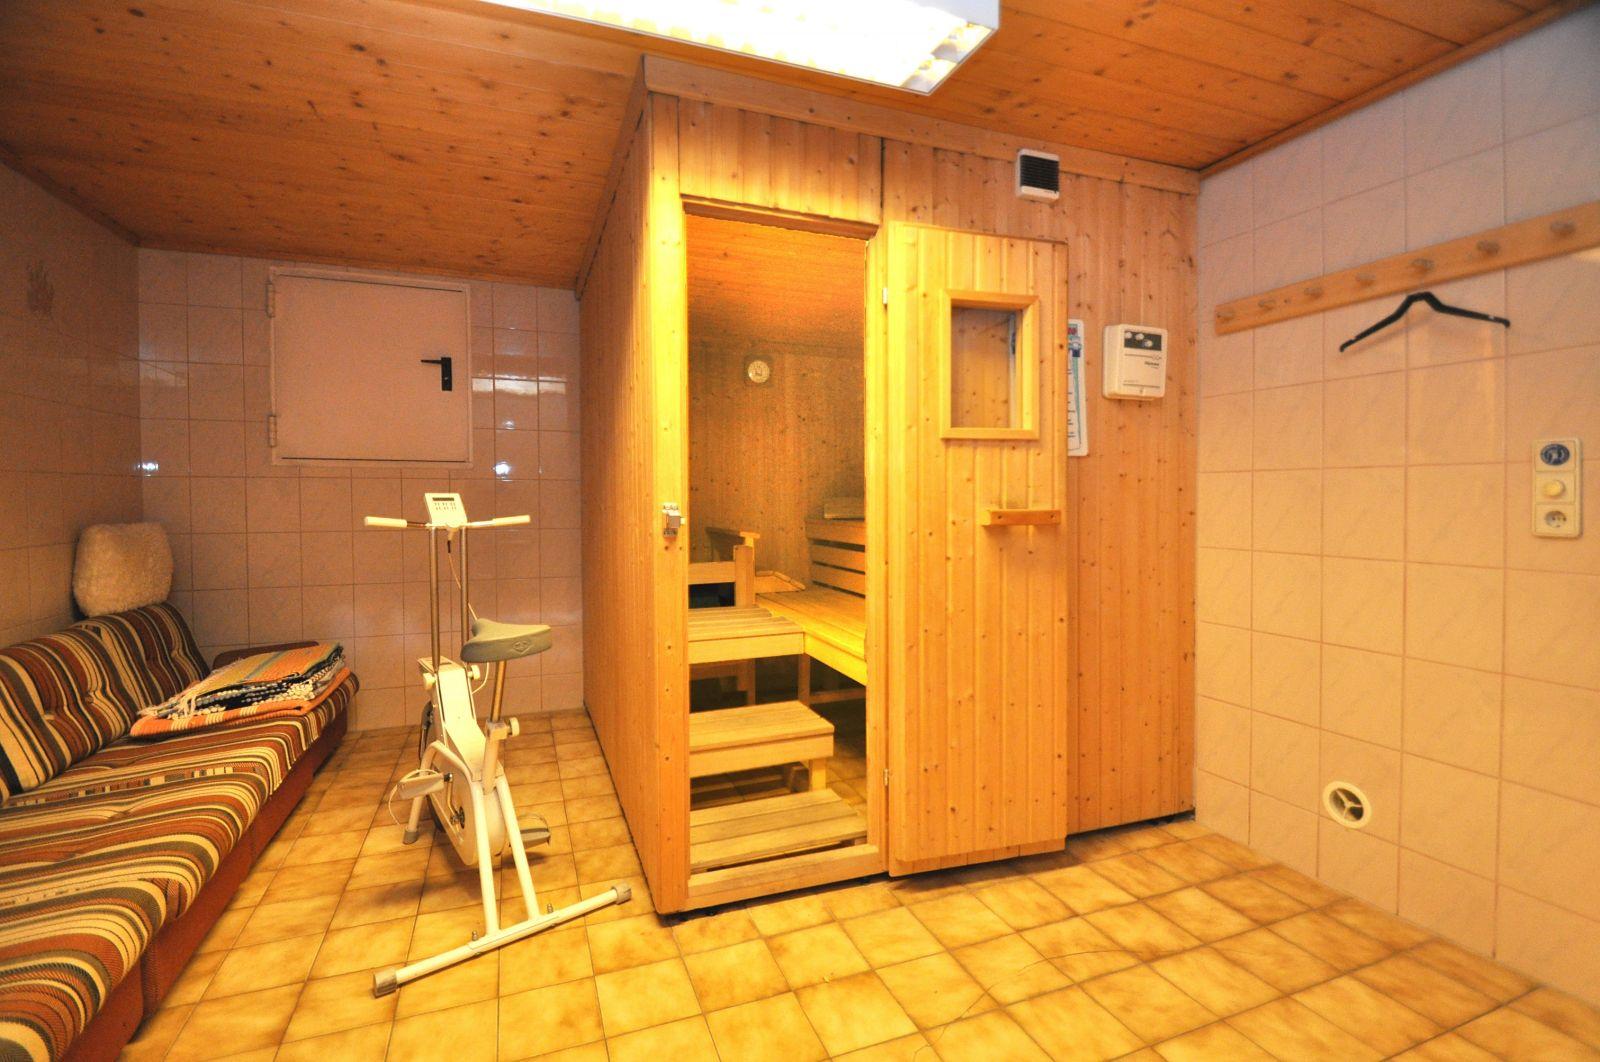 haus amadeus fotogalerie von appartements amadeus 21 bilder von appartements amadeus. Black Bedroom Furniture Sets. Home Design Ideas